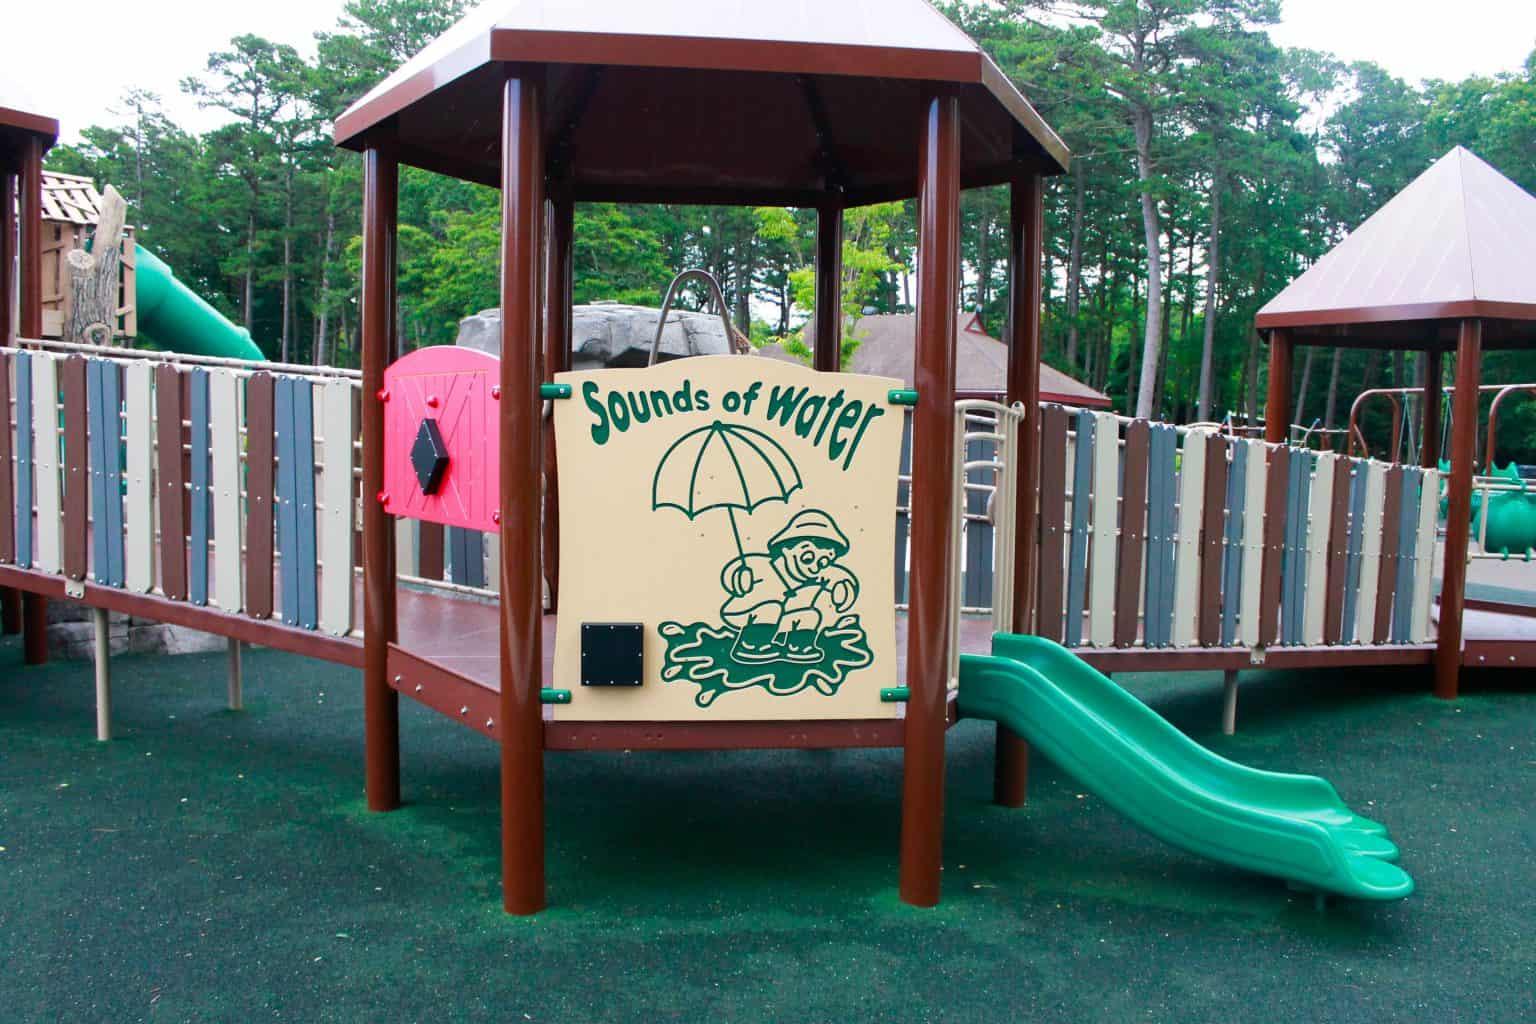 windward-beach-park-playground-brick-nj_27651421723_o-1536x1024